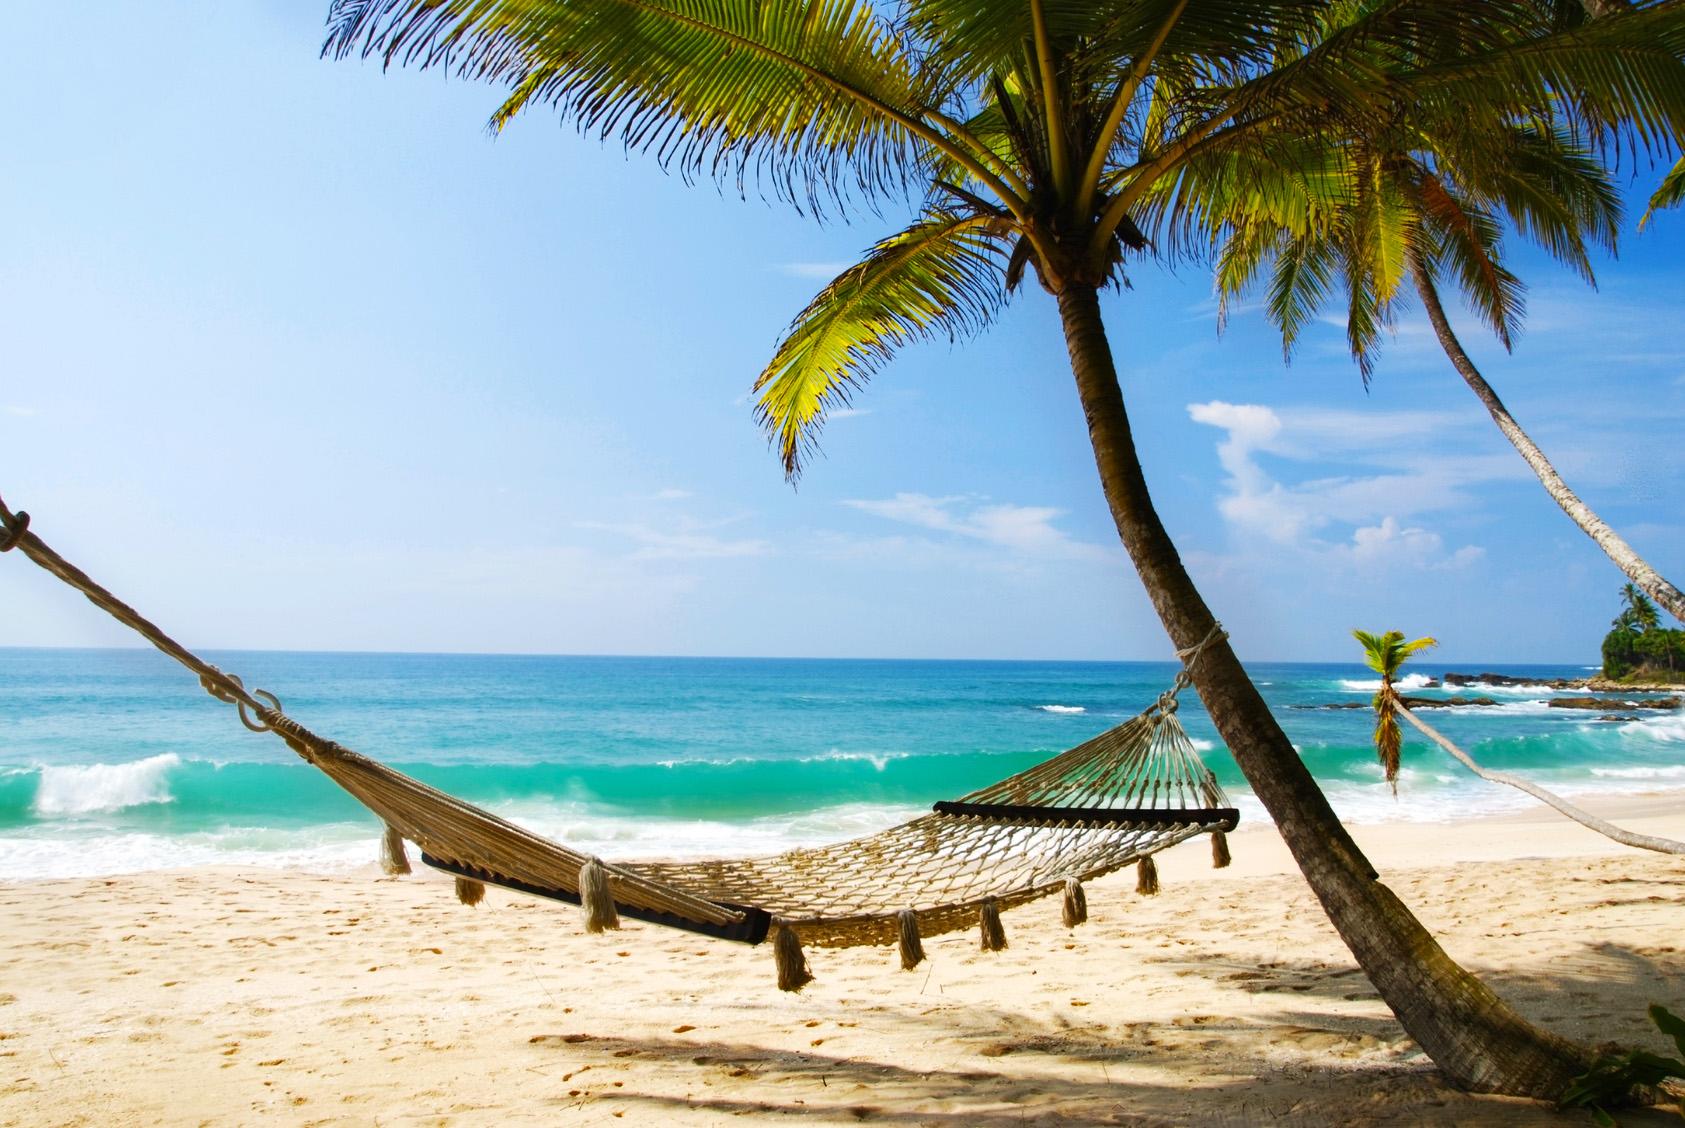 Palmen Strand Hängematte Sri Lanka Karibik